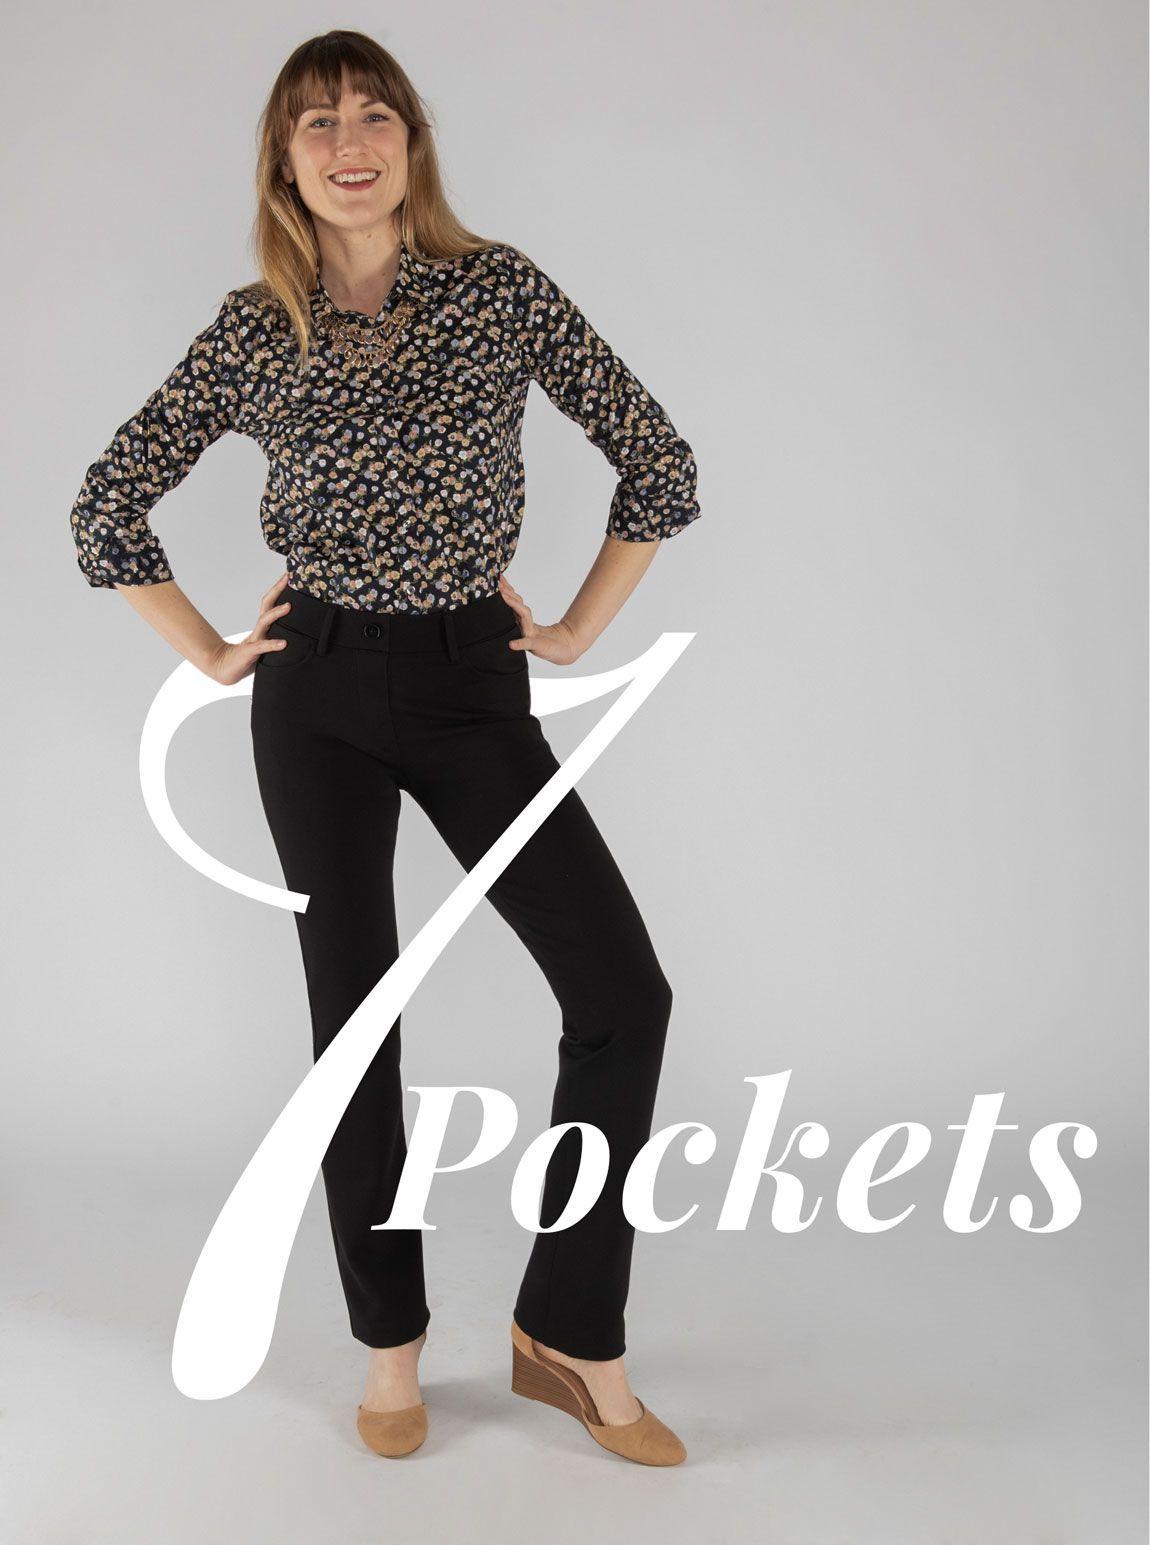 Straight Leg 7 Pocket Dress Pant Yoga Pants Black Dress Yoga Pants Black Pants Outfit Stylish Pants [ 1545 x 1150 Pixel ]